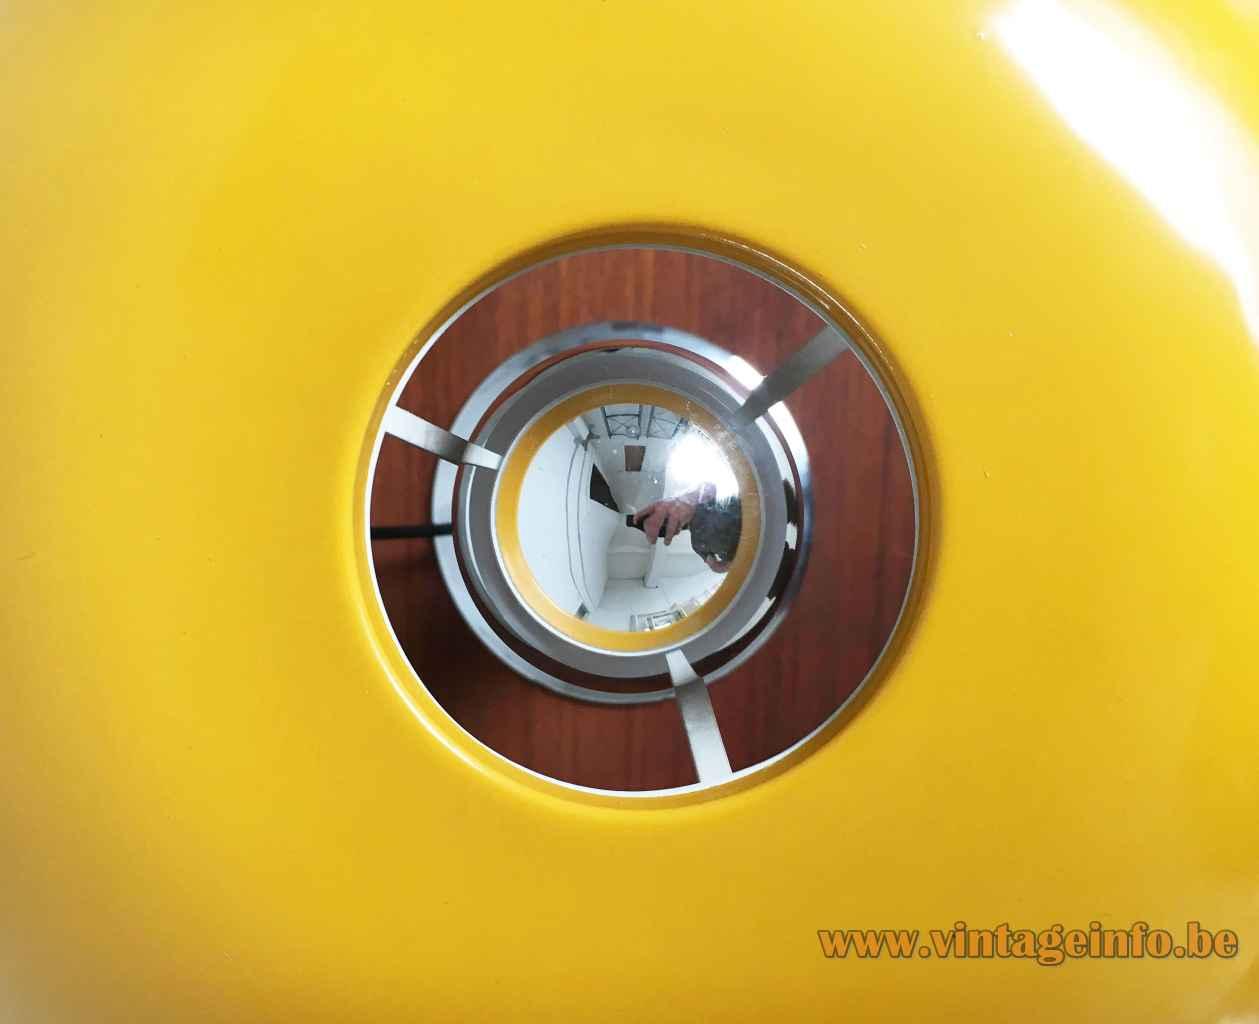 Hustadt-Leuchten yellow mushroom desk lamp round chrome base & rod round hole lampshade 1970s Germany top view